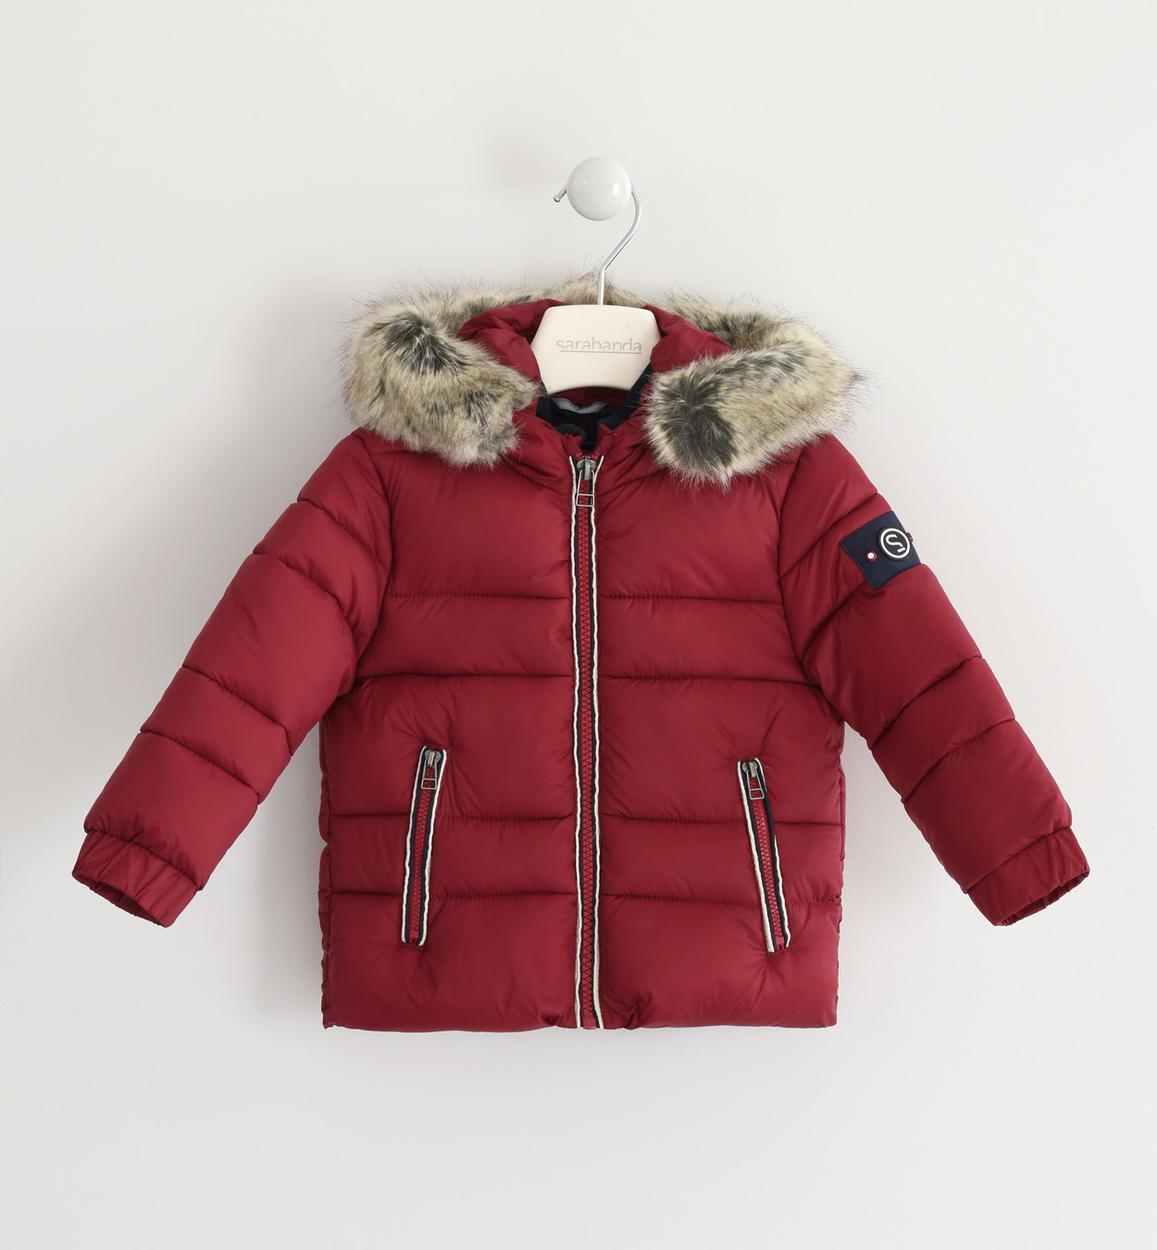 outlet store 79c2d 6aa19 Piumino invernale con fodera a contrasto per bambino da 6 mesi a 7 anni  Sarabanda